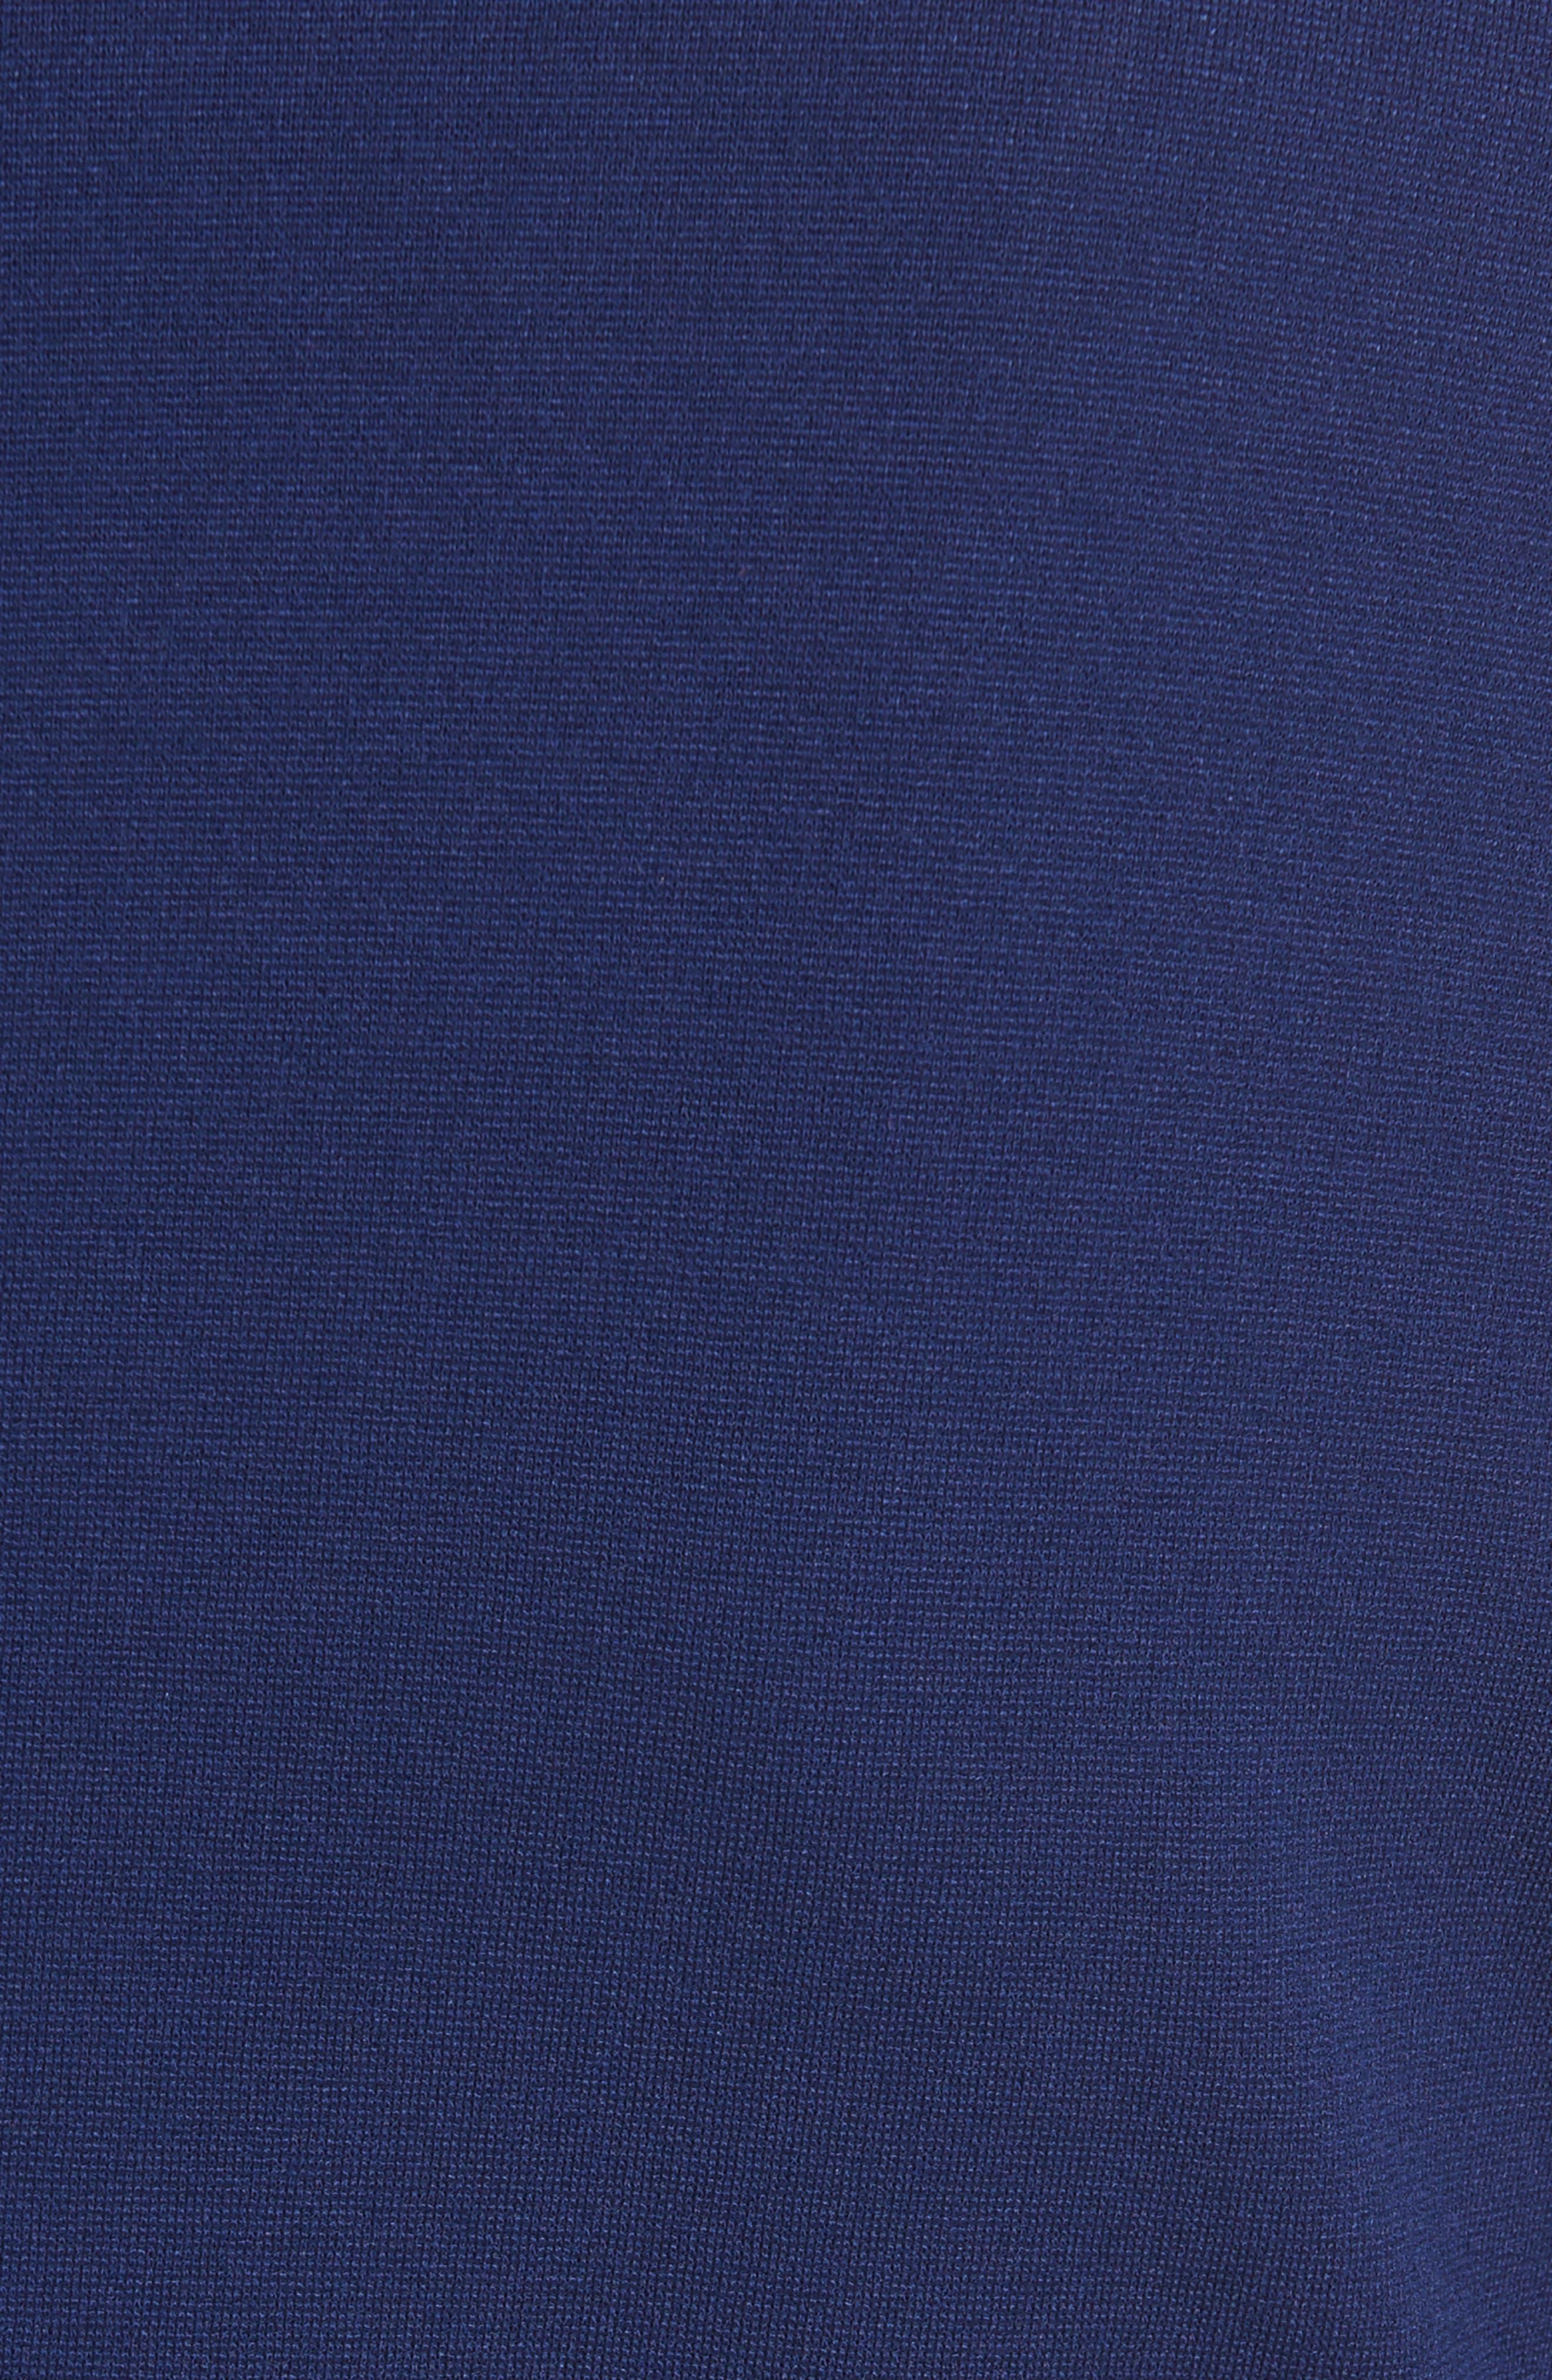 Alternate Image 3  - Armani Collezioni Side Gather Milano Jersey Dress